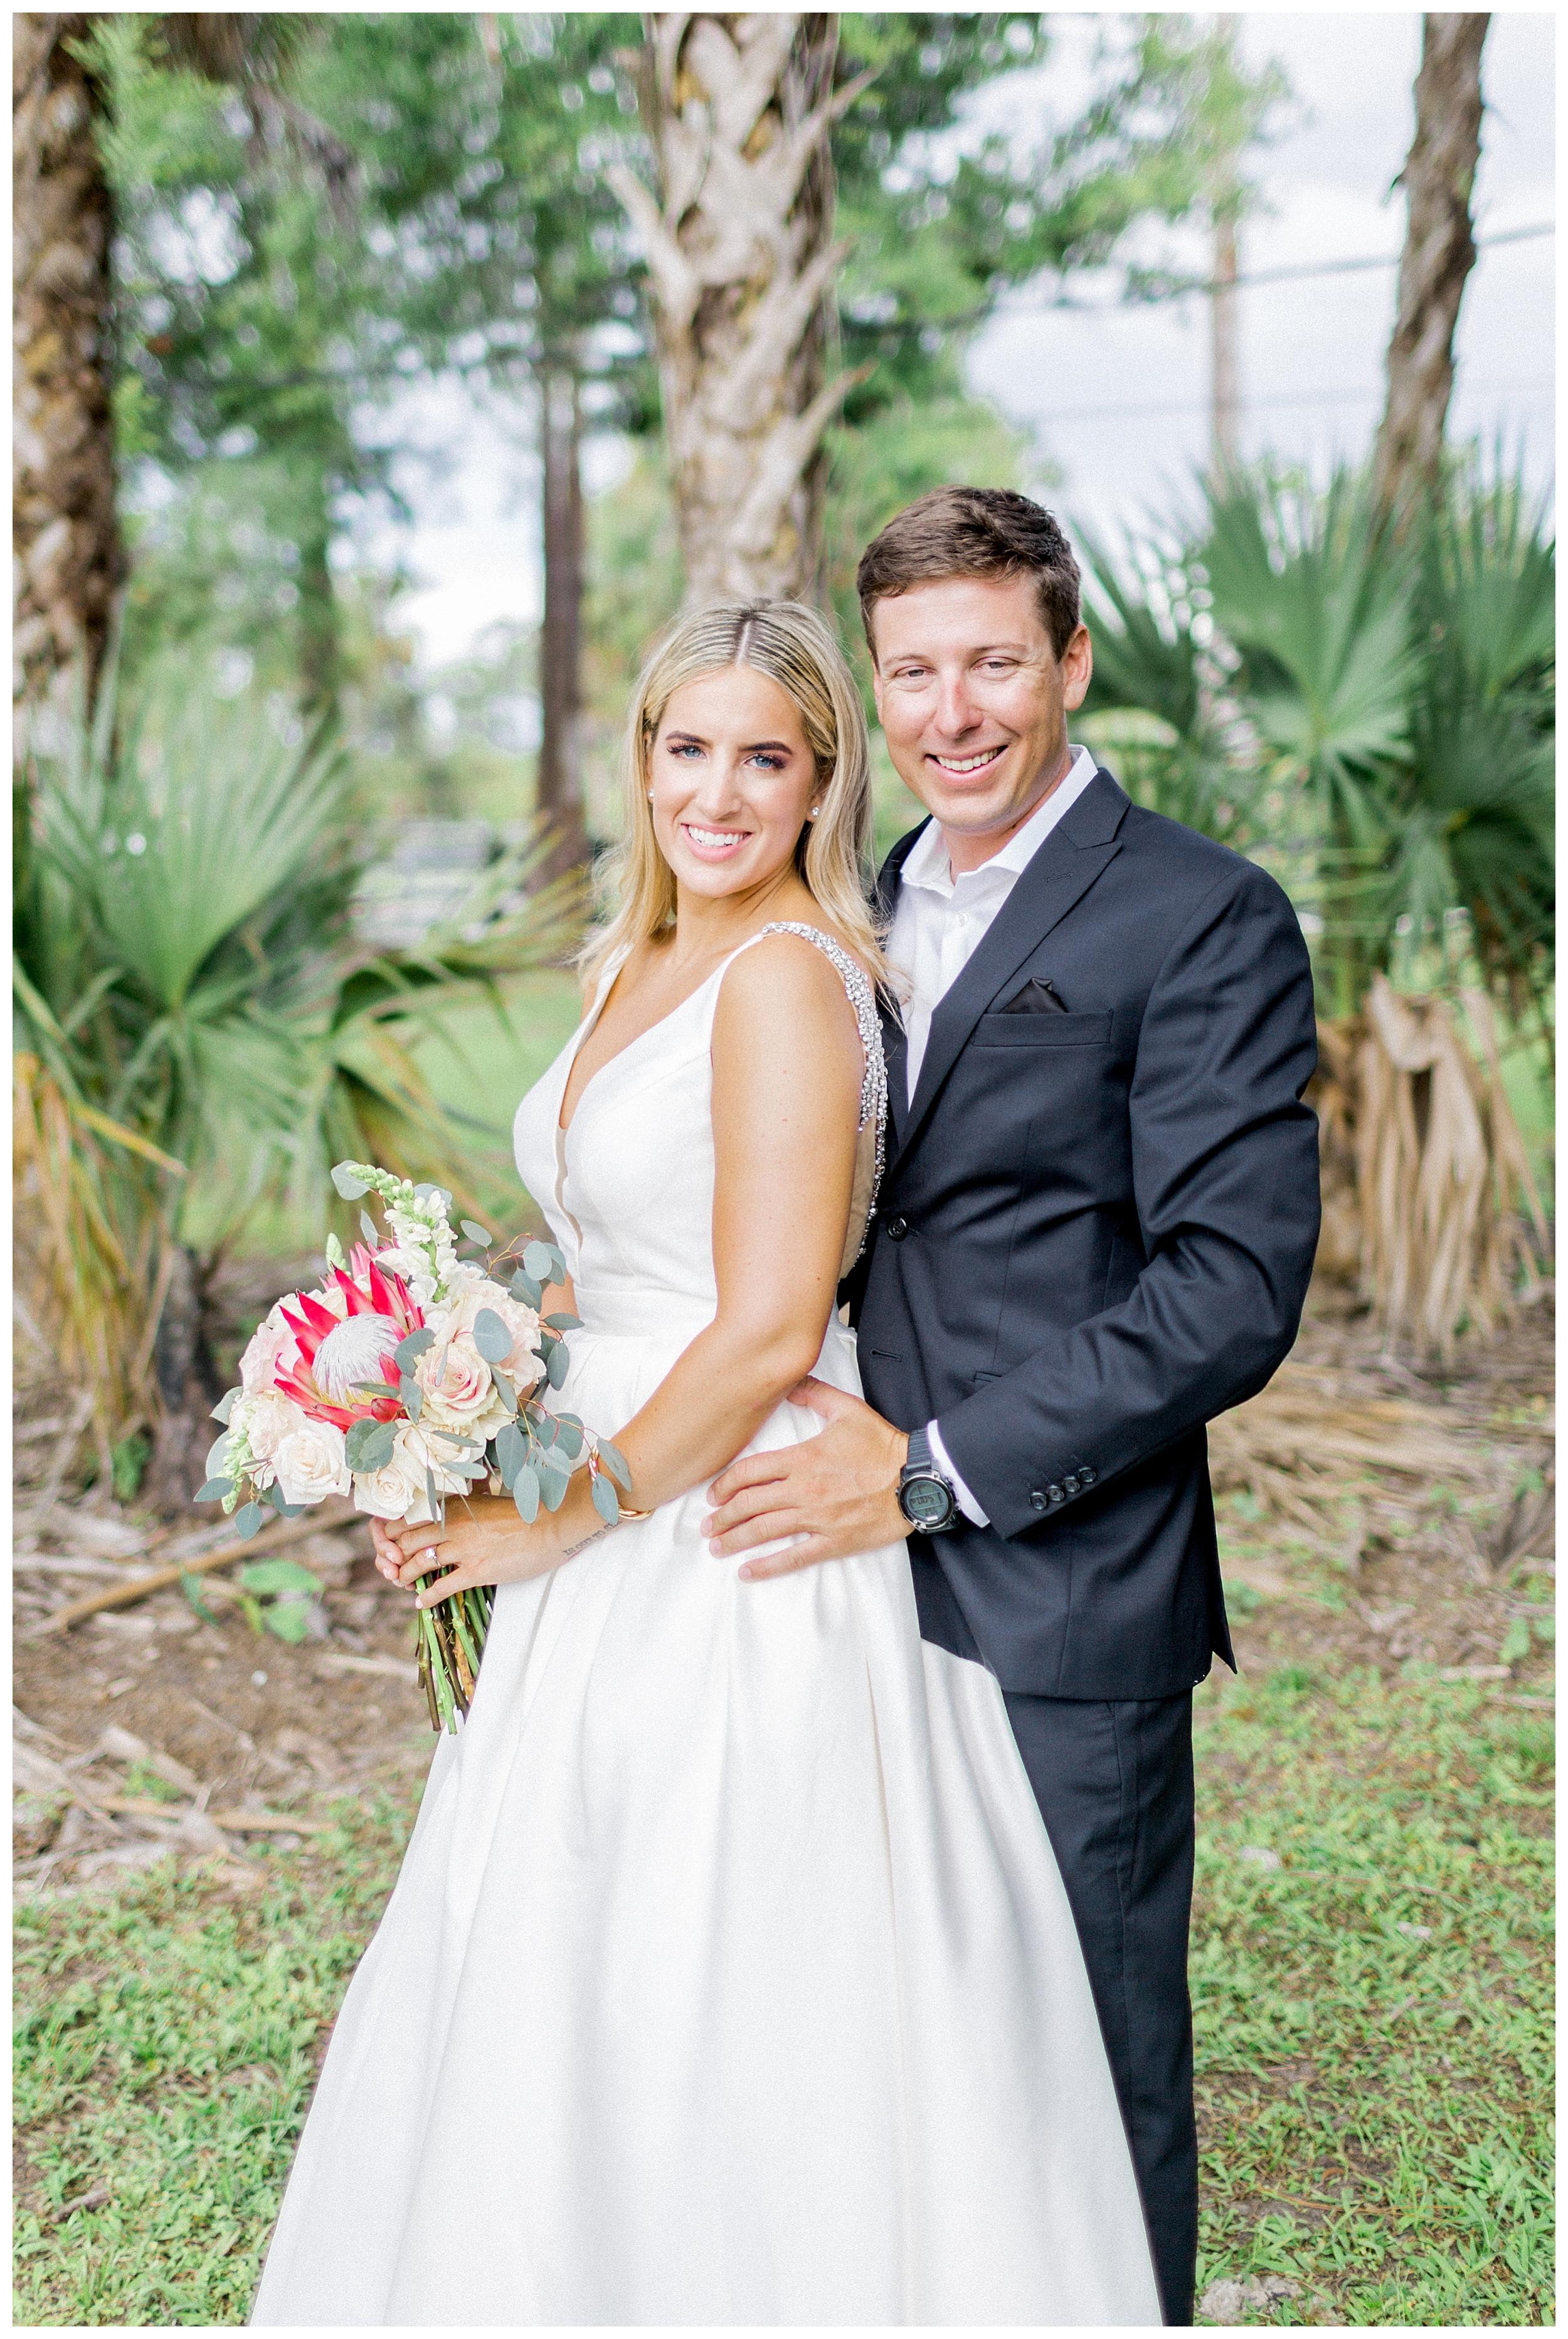 South Florida Wedding Photographer Kir Tuben_0032.jpg